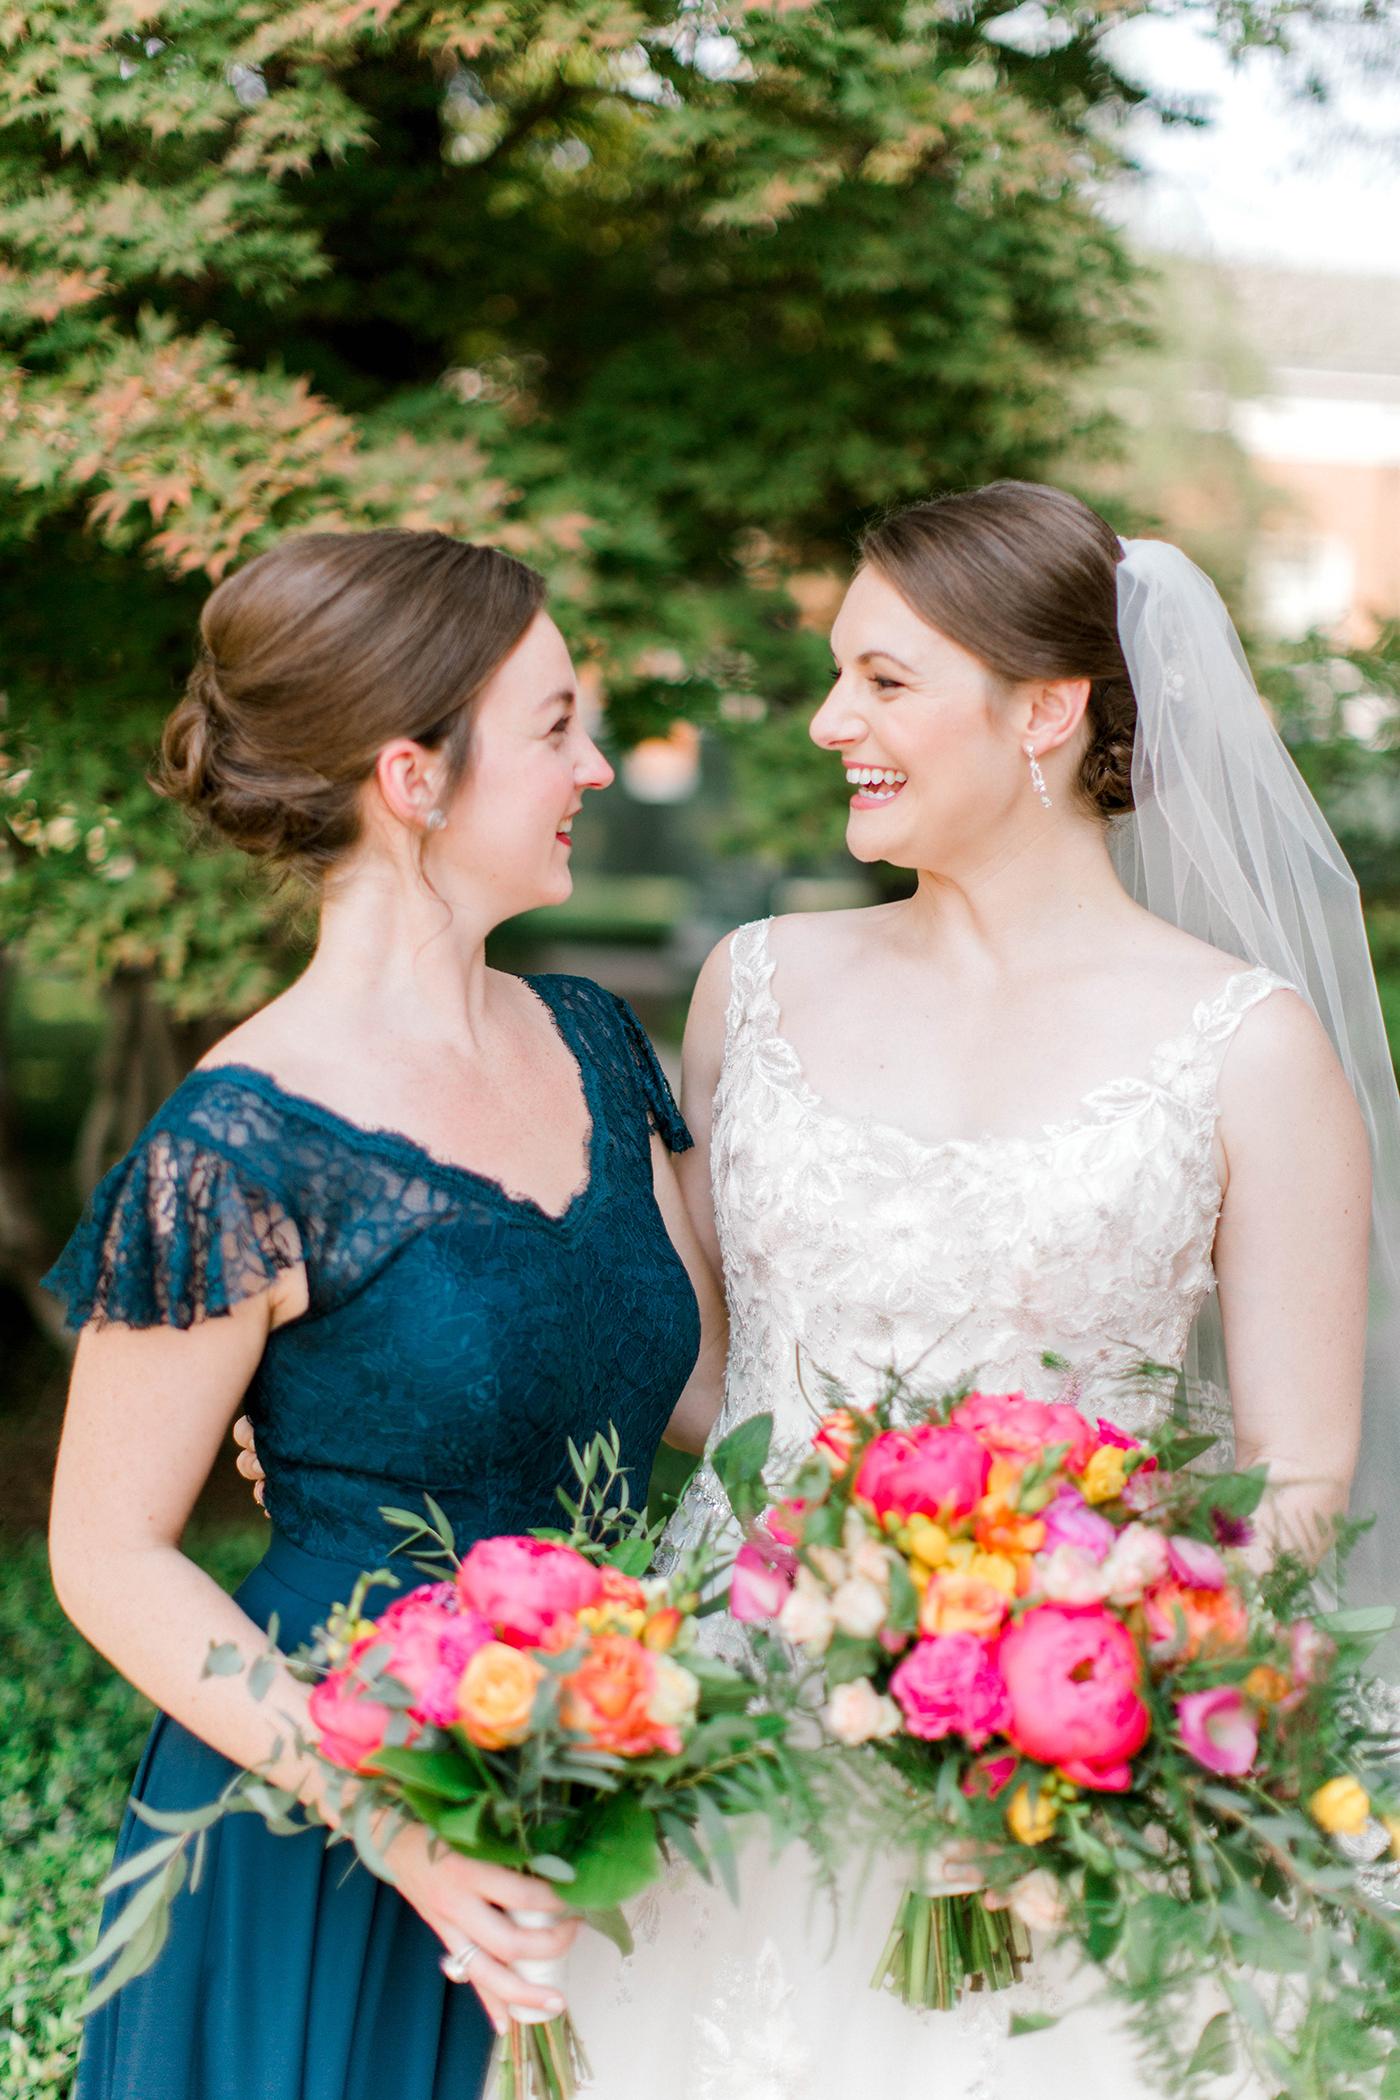 Dallas TX Wedding Planner - Allday Events - Hall on Dragon Wedding - 00075.jpg